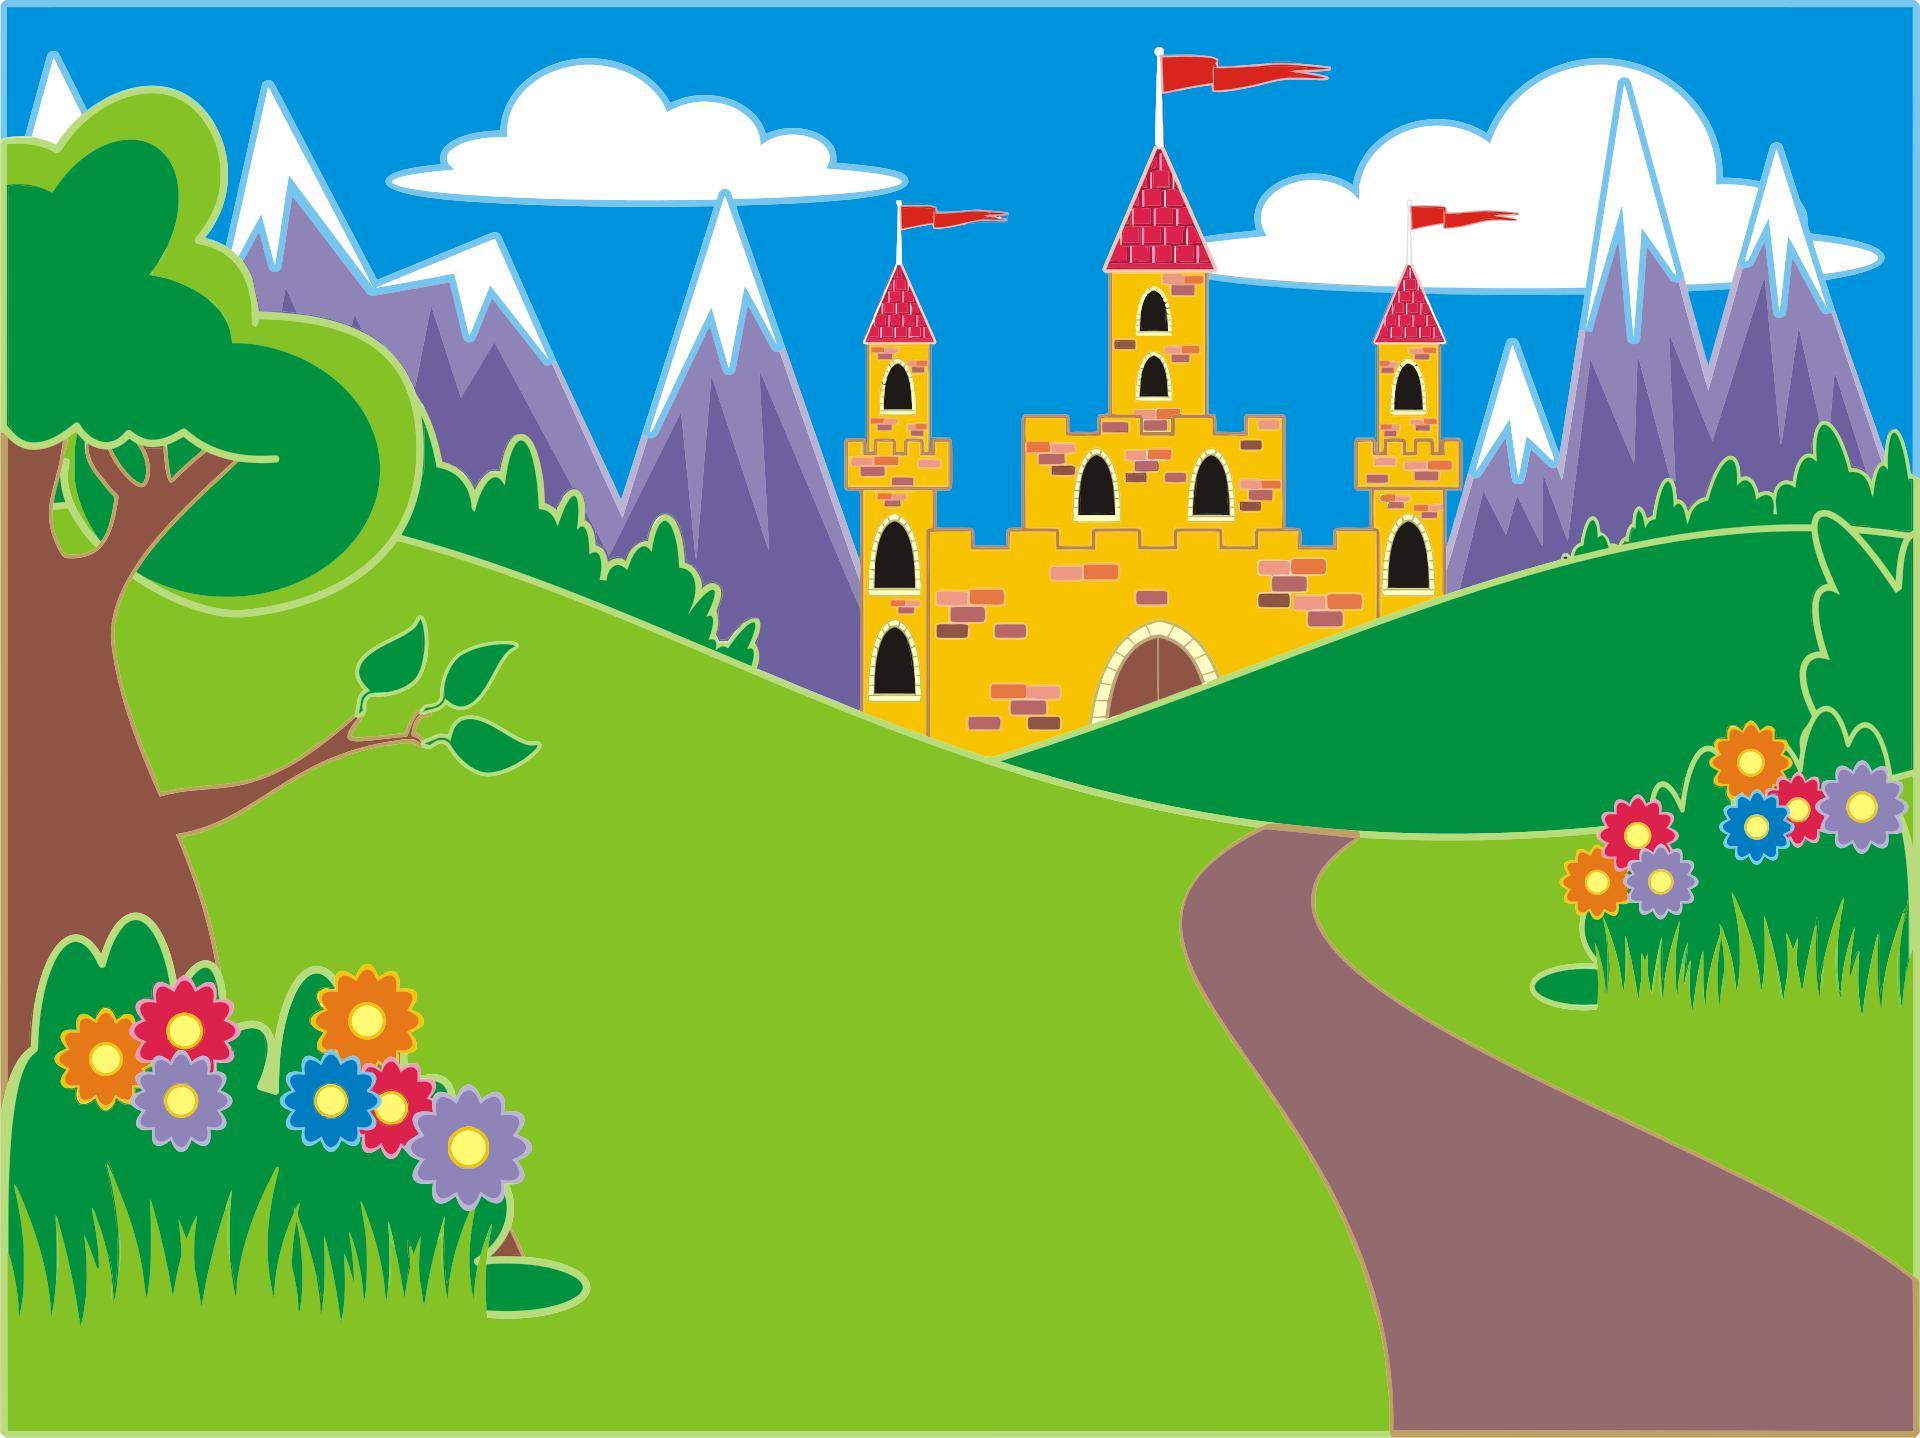 Fairytale clipart scenery. Fantasy castle landscape design